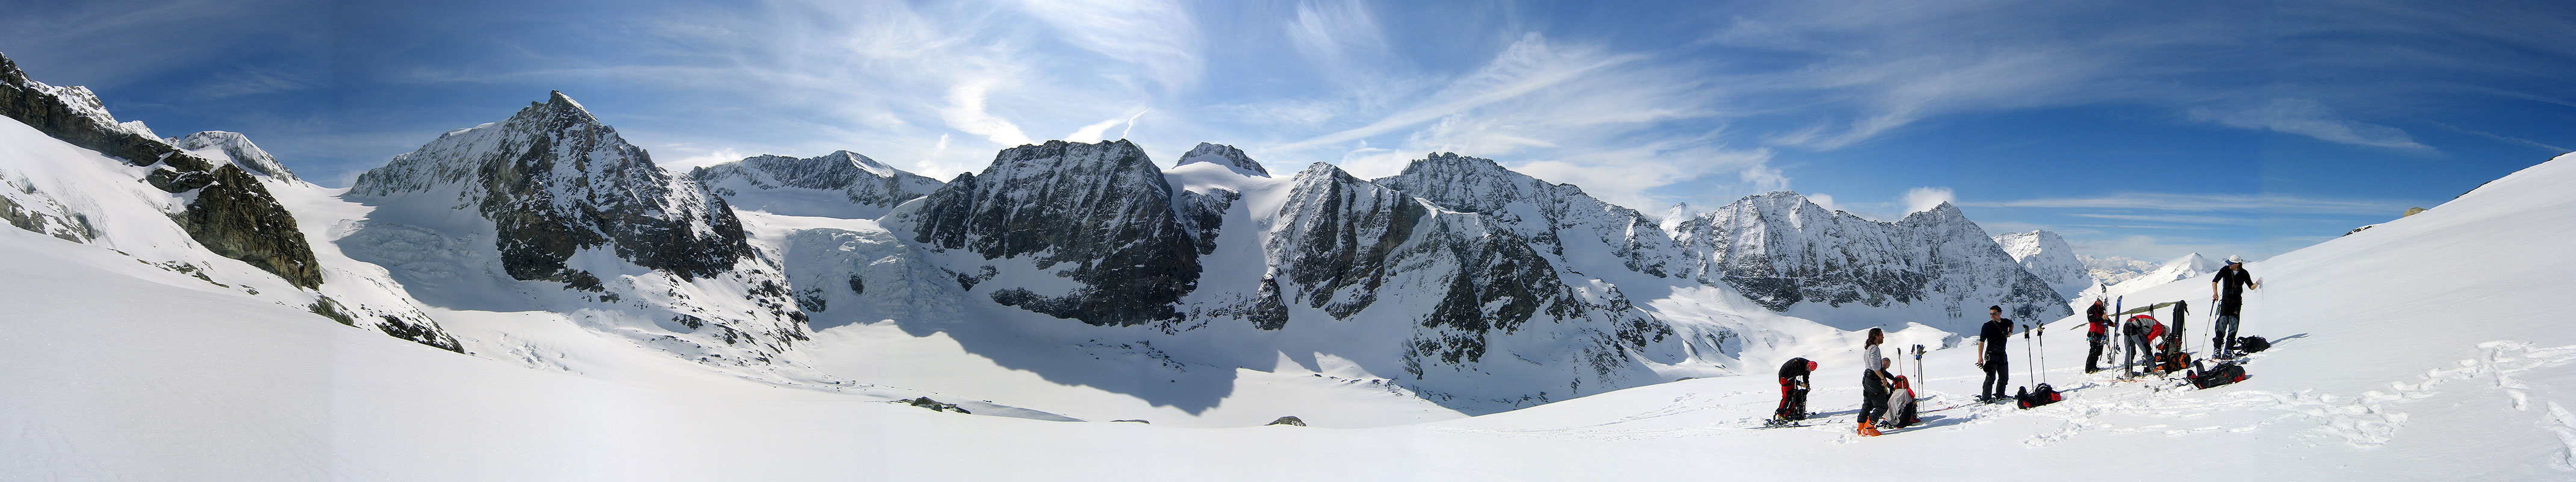 La Ruinette Walliser Alpen / Alpes valaisannes Schweiz panorama 25